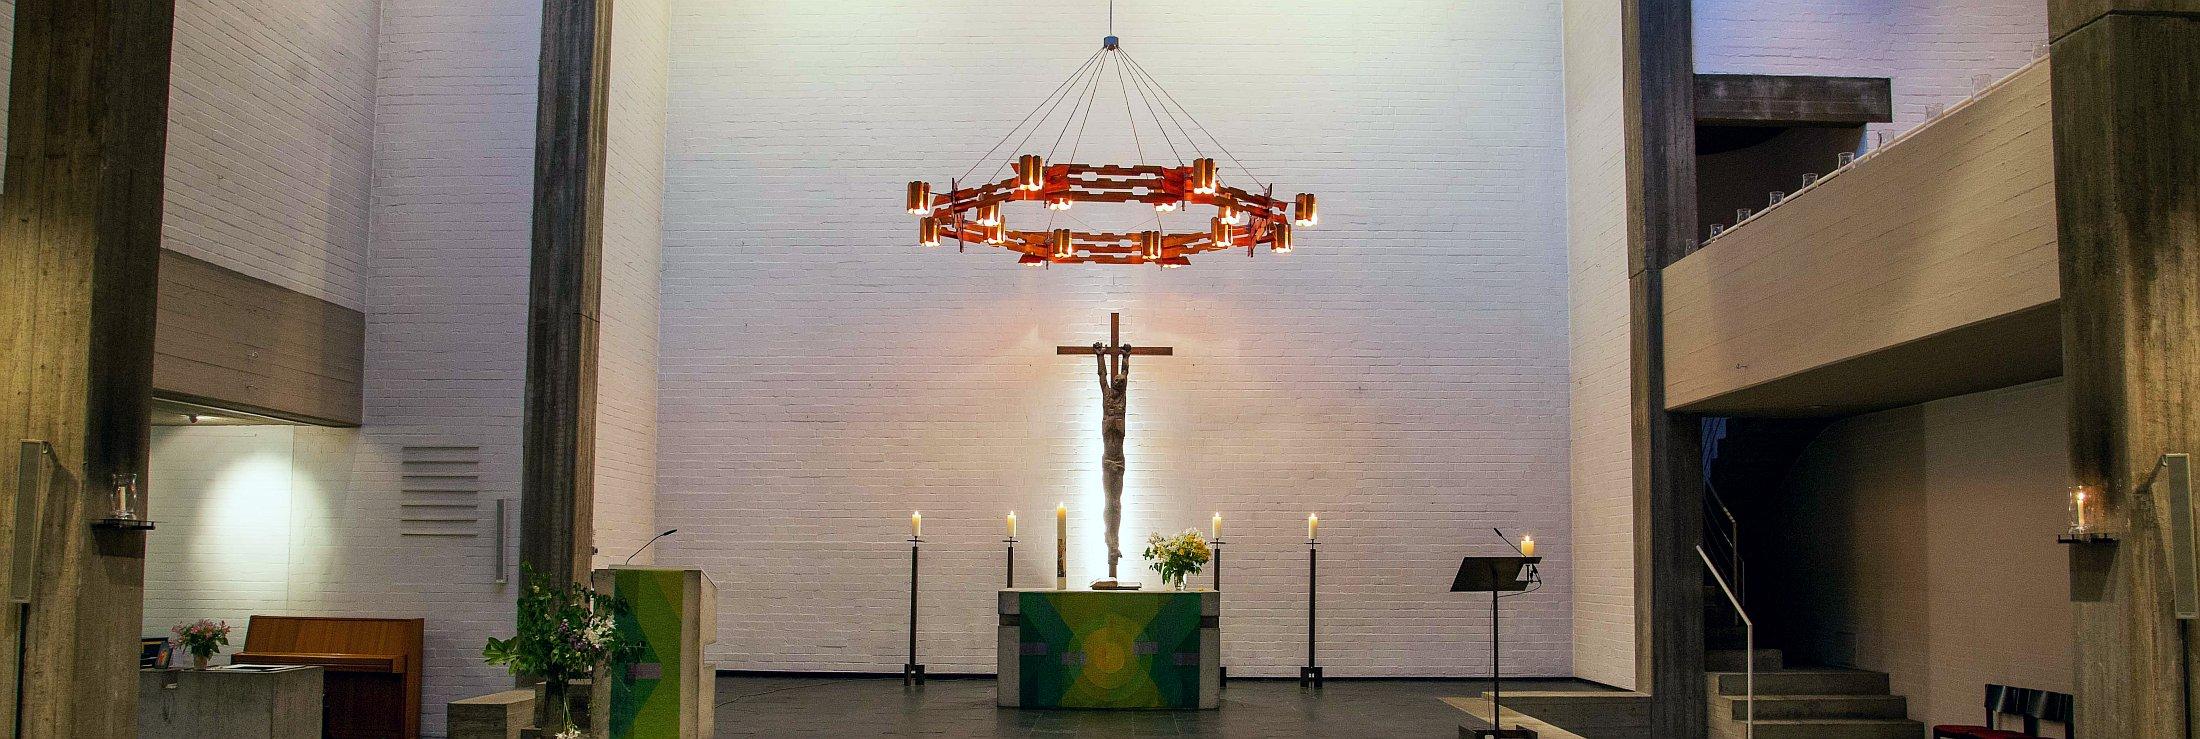 Altarraum der Nathan-Süderblom-Kirche in Reinbek-West